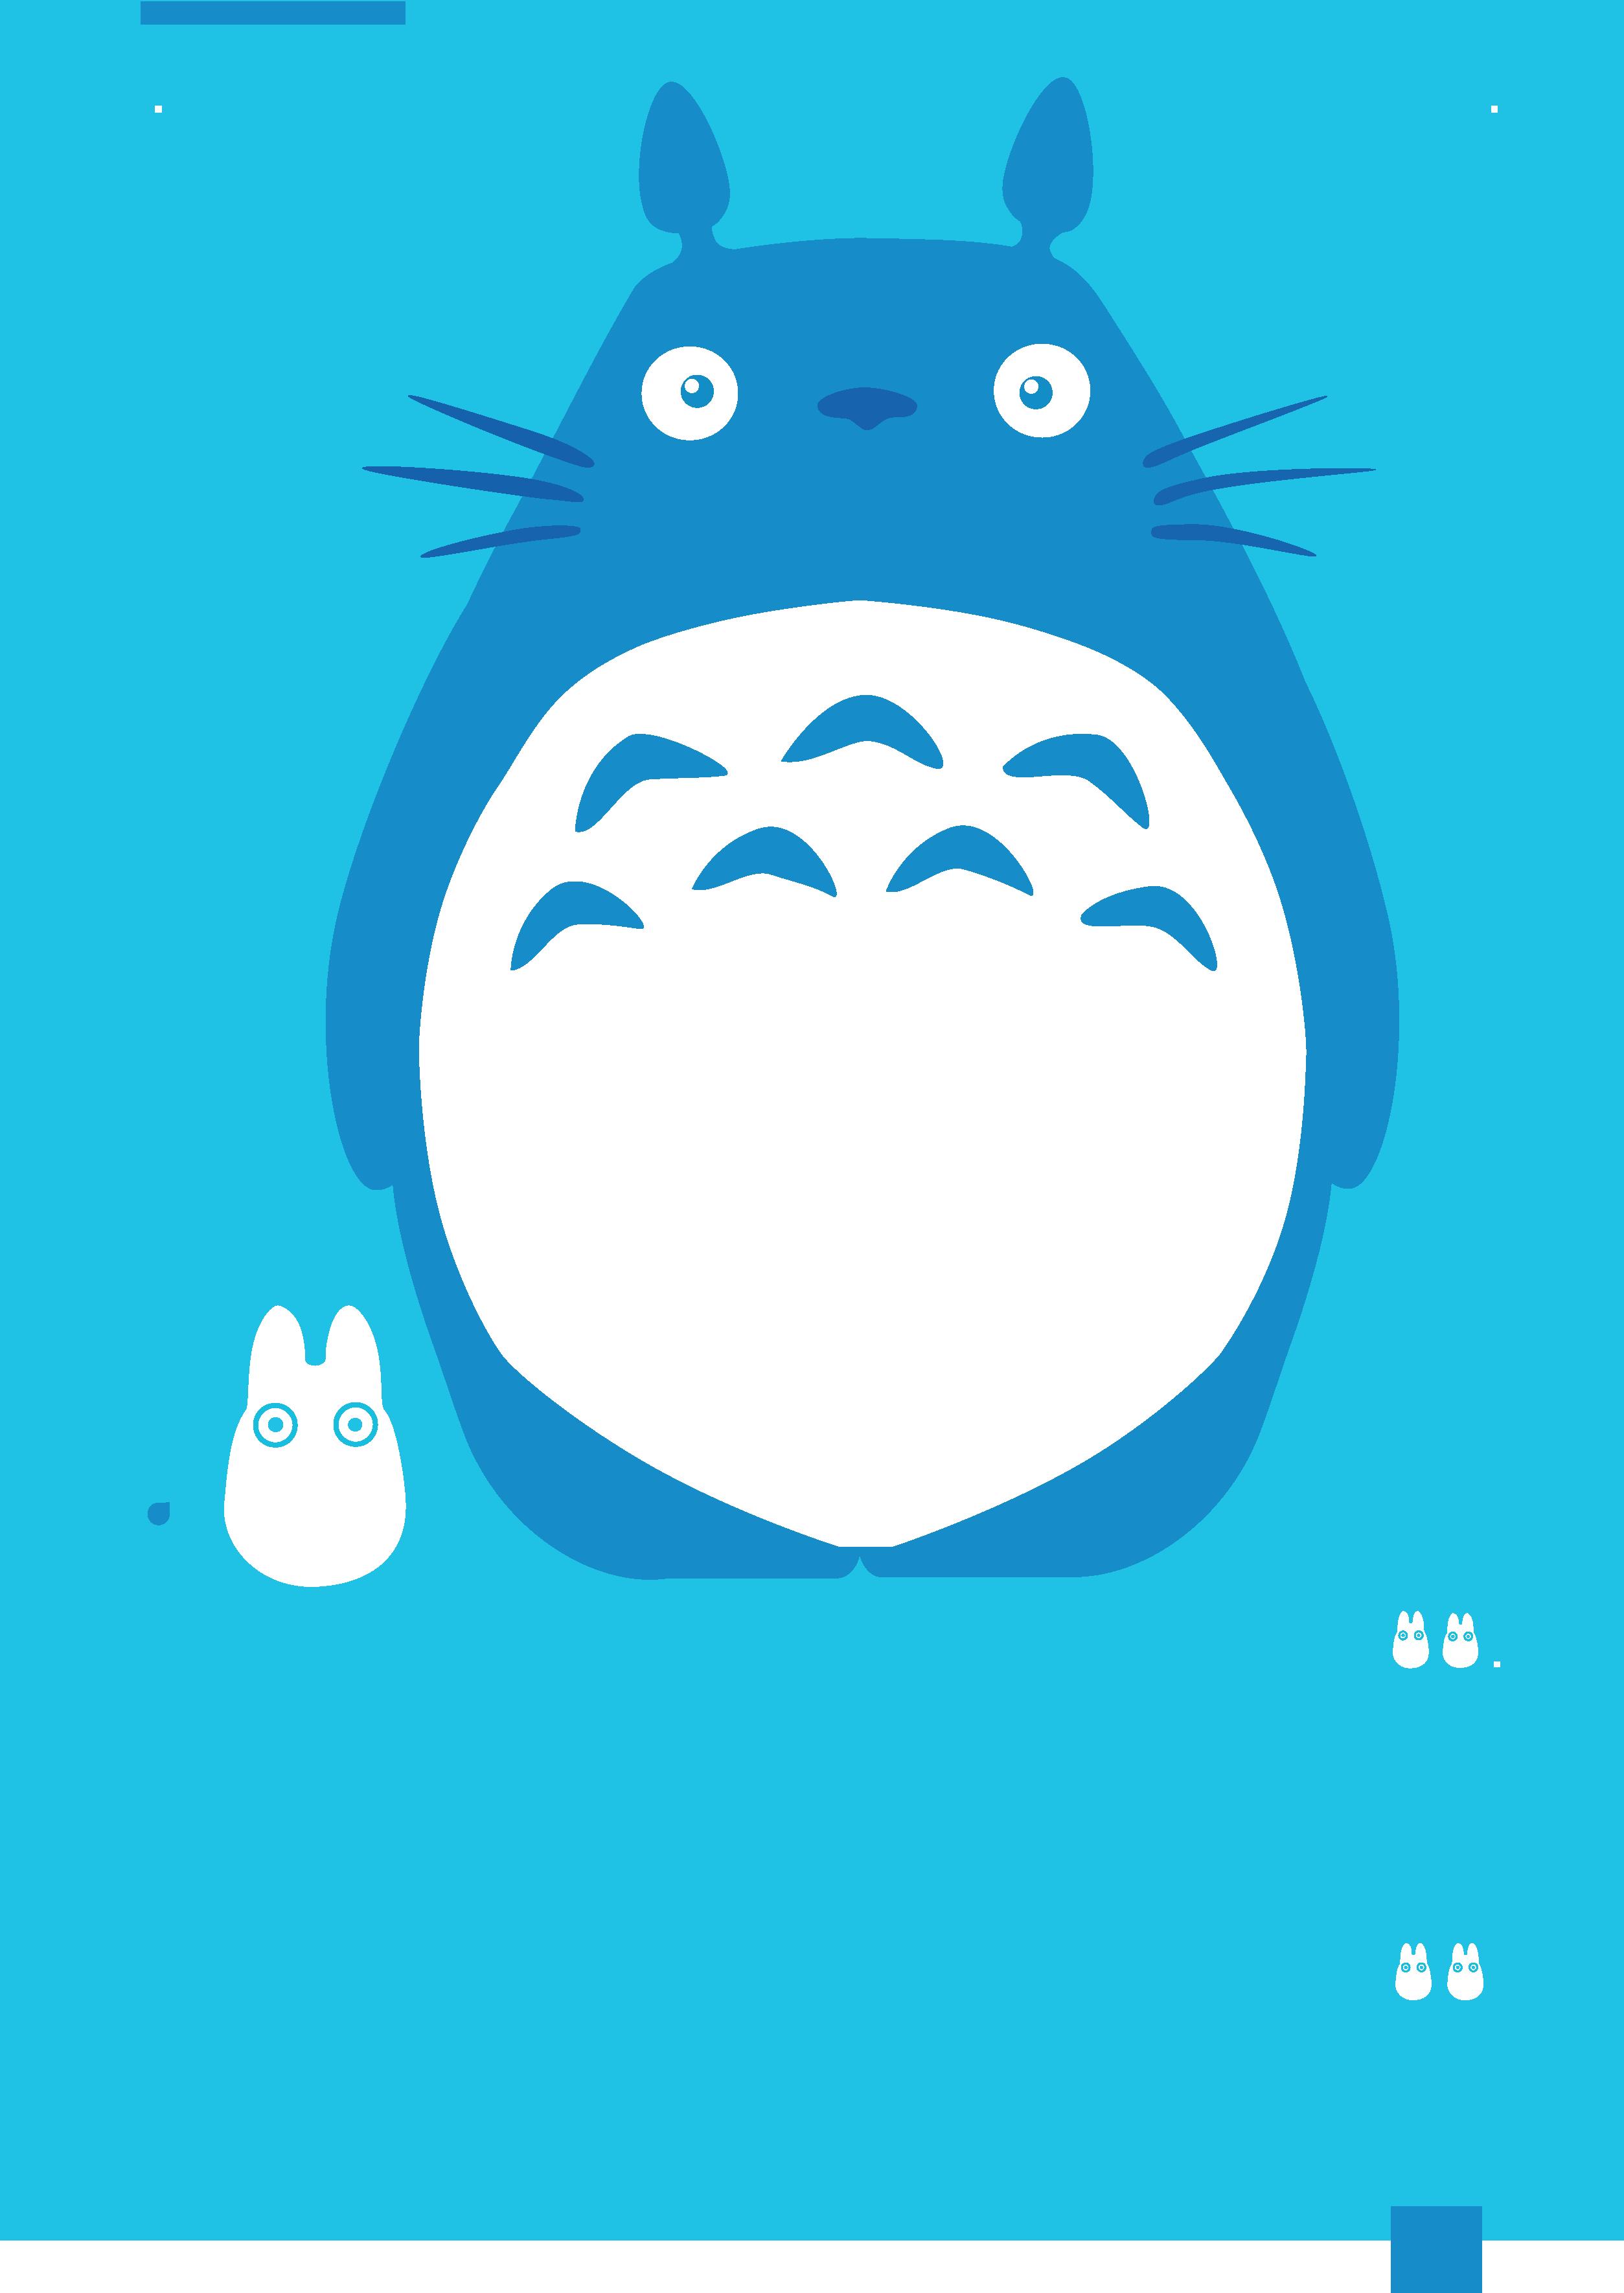 My Neighbor Totoro - image 2 - student project